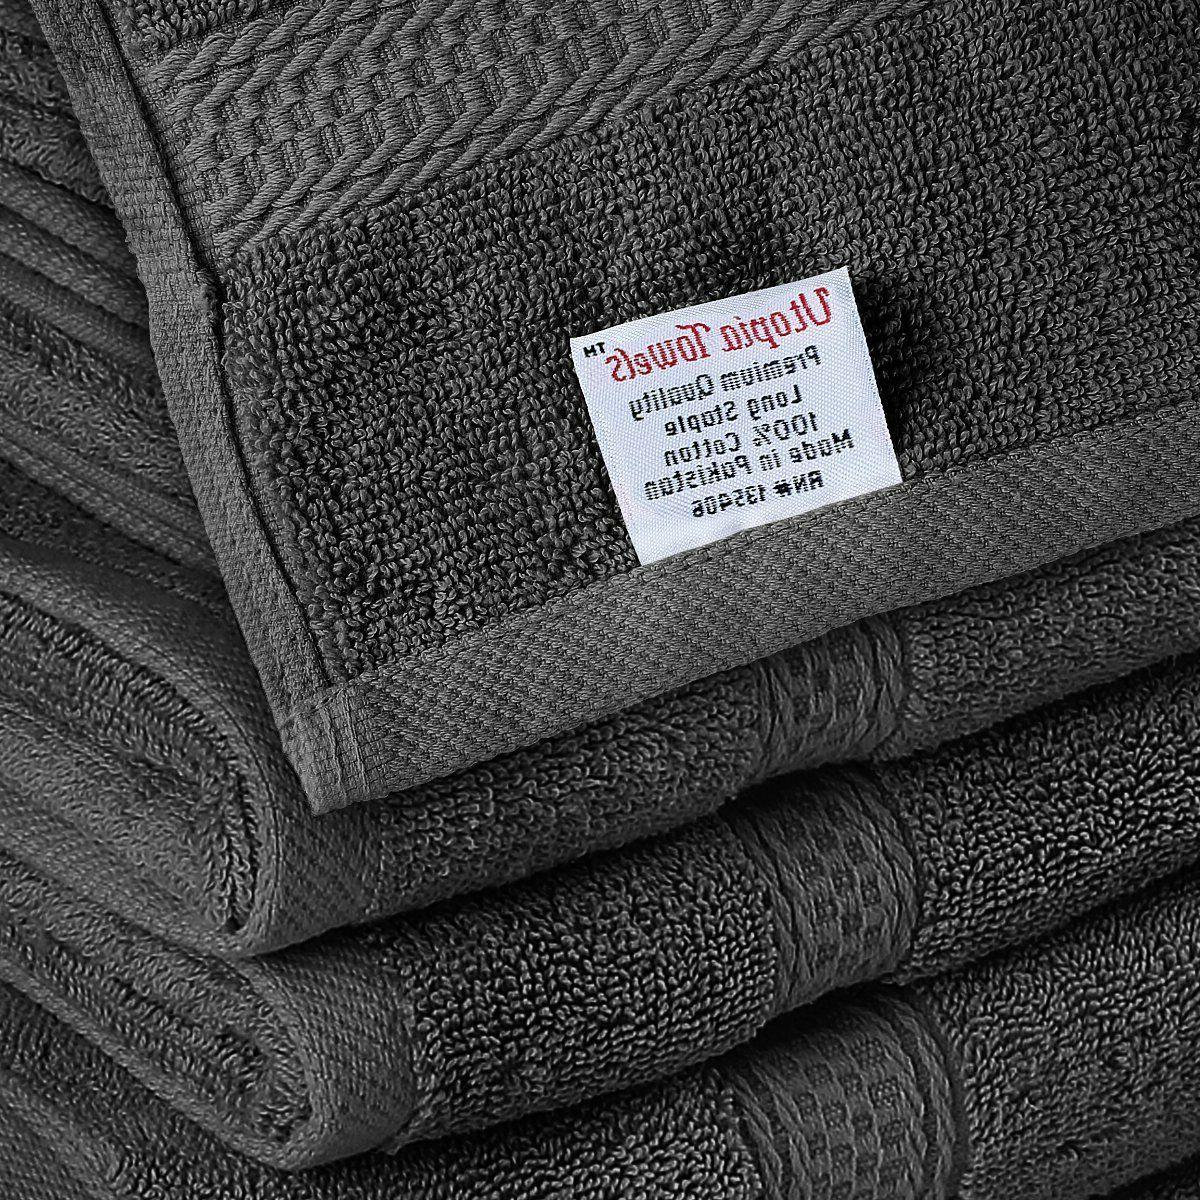 Utopia Towel Set, Dark 2 Hand Towels